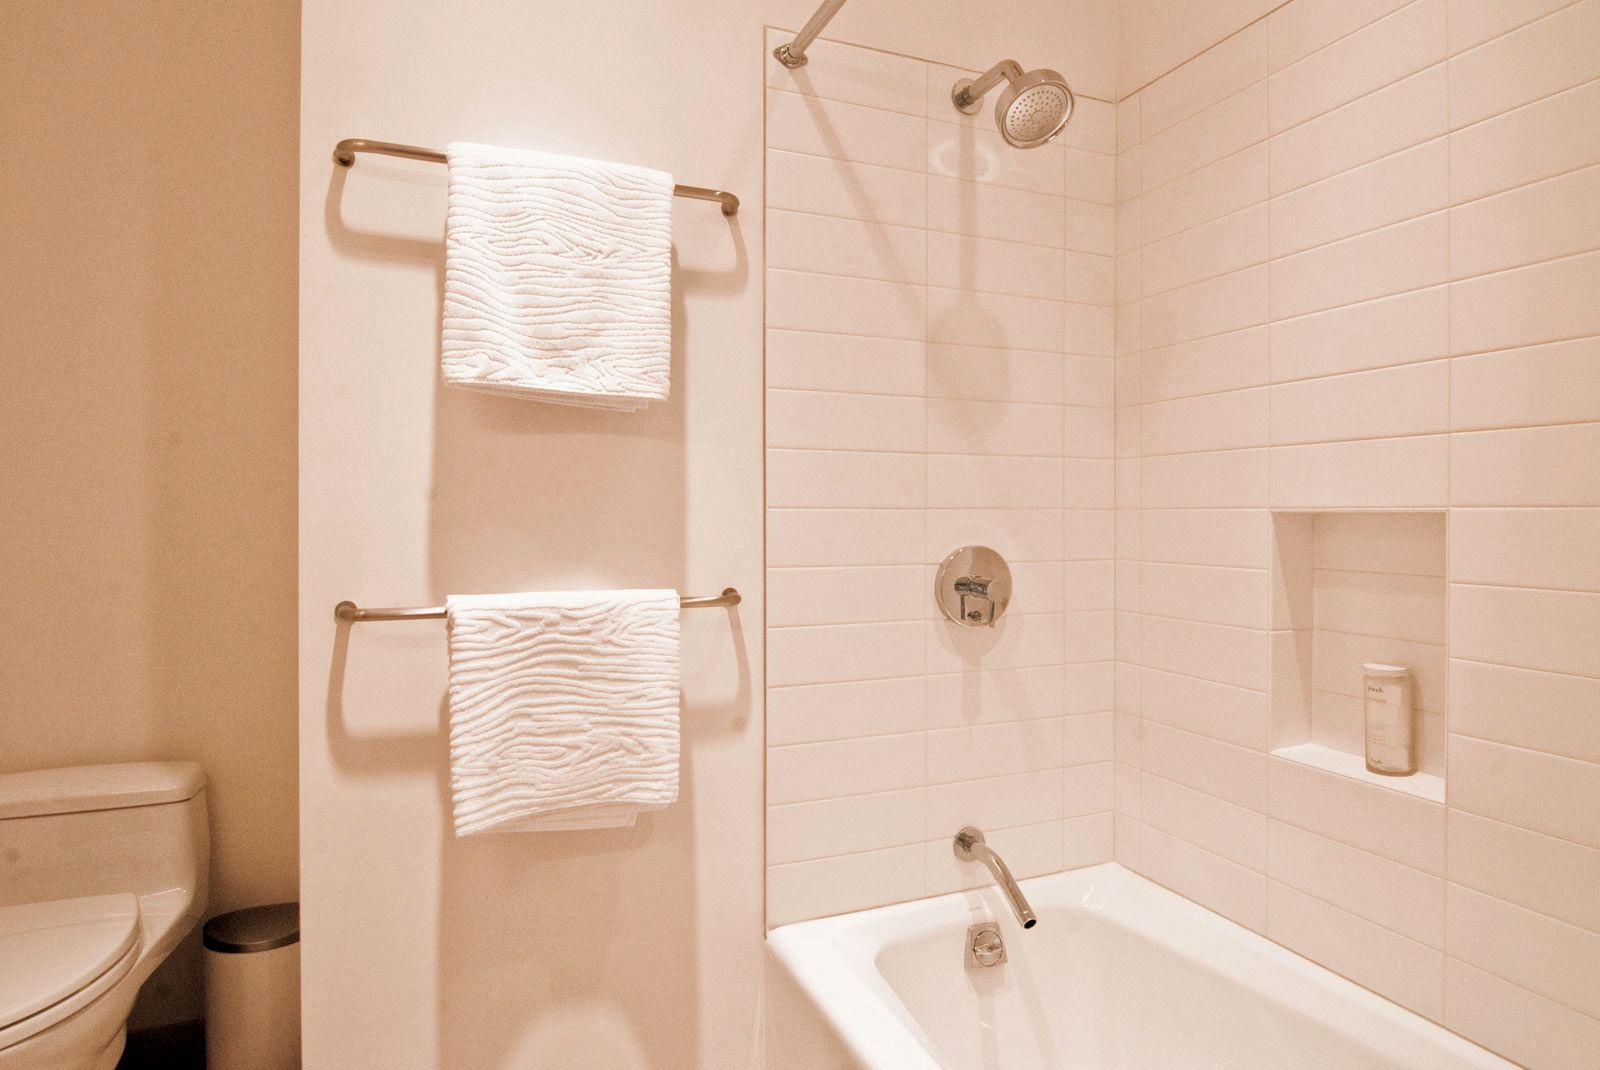 fantastic bathroom shower hardware model-Fresh Bathroom Shower Hardware Architecture